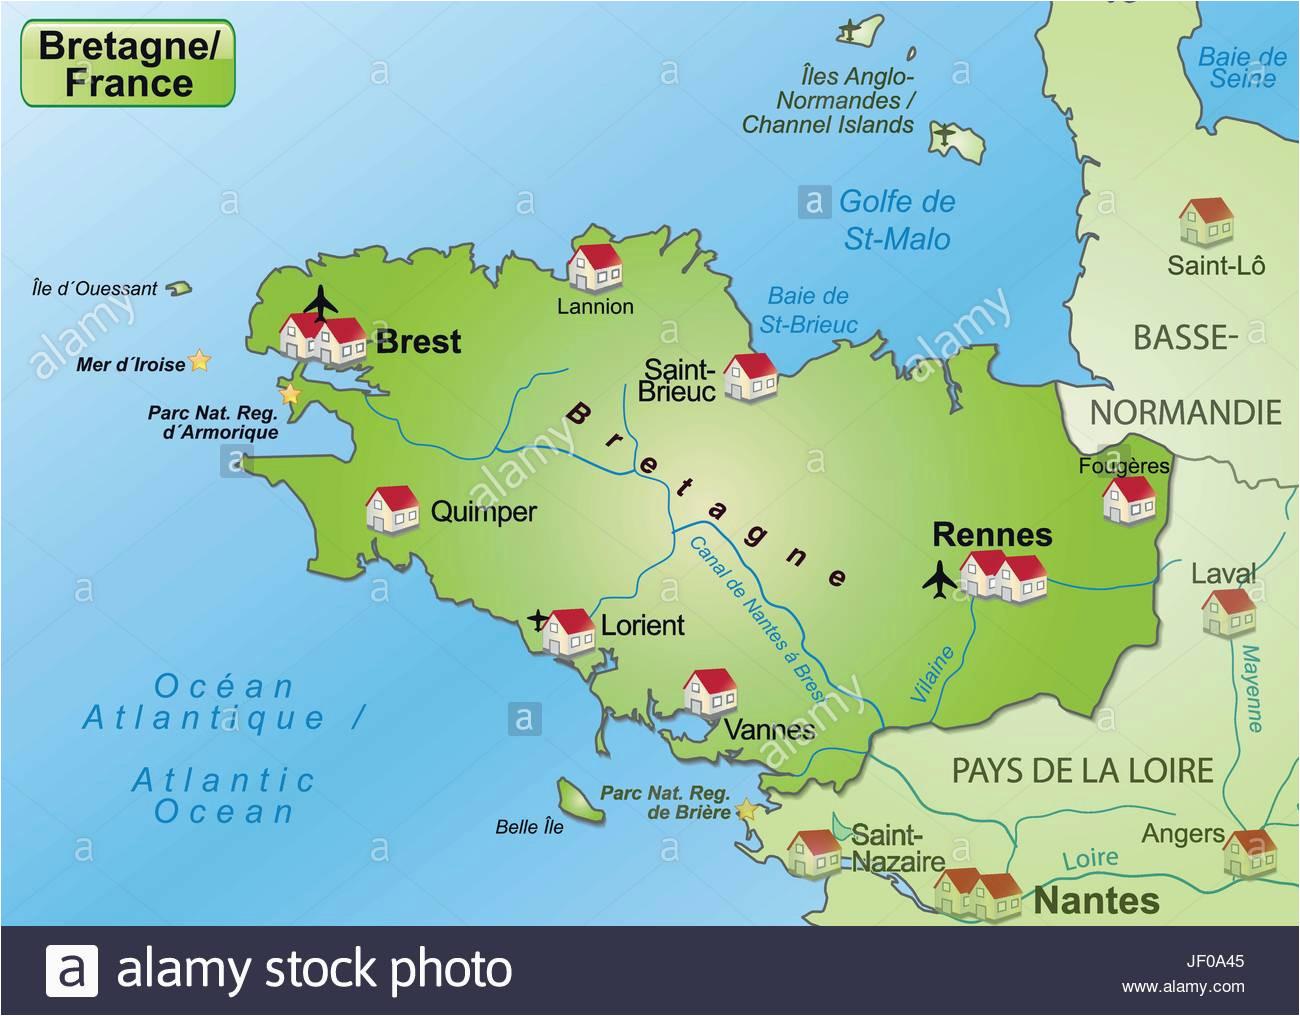 map of brest france stockfotos map of brest france bilder alamy